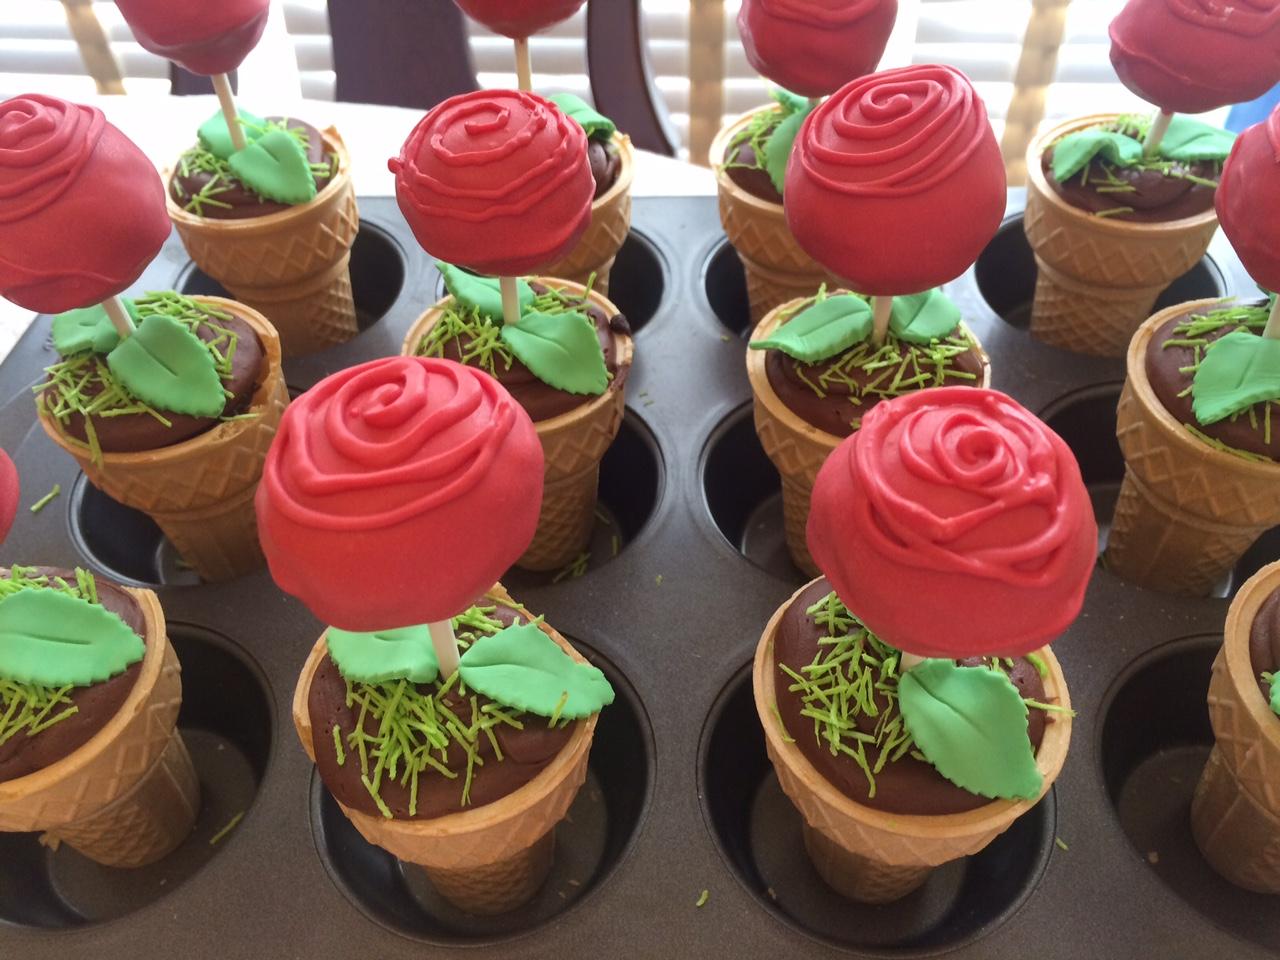 Cakes By Dodi 2014 2015 Cakes